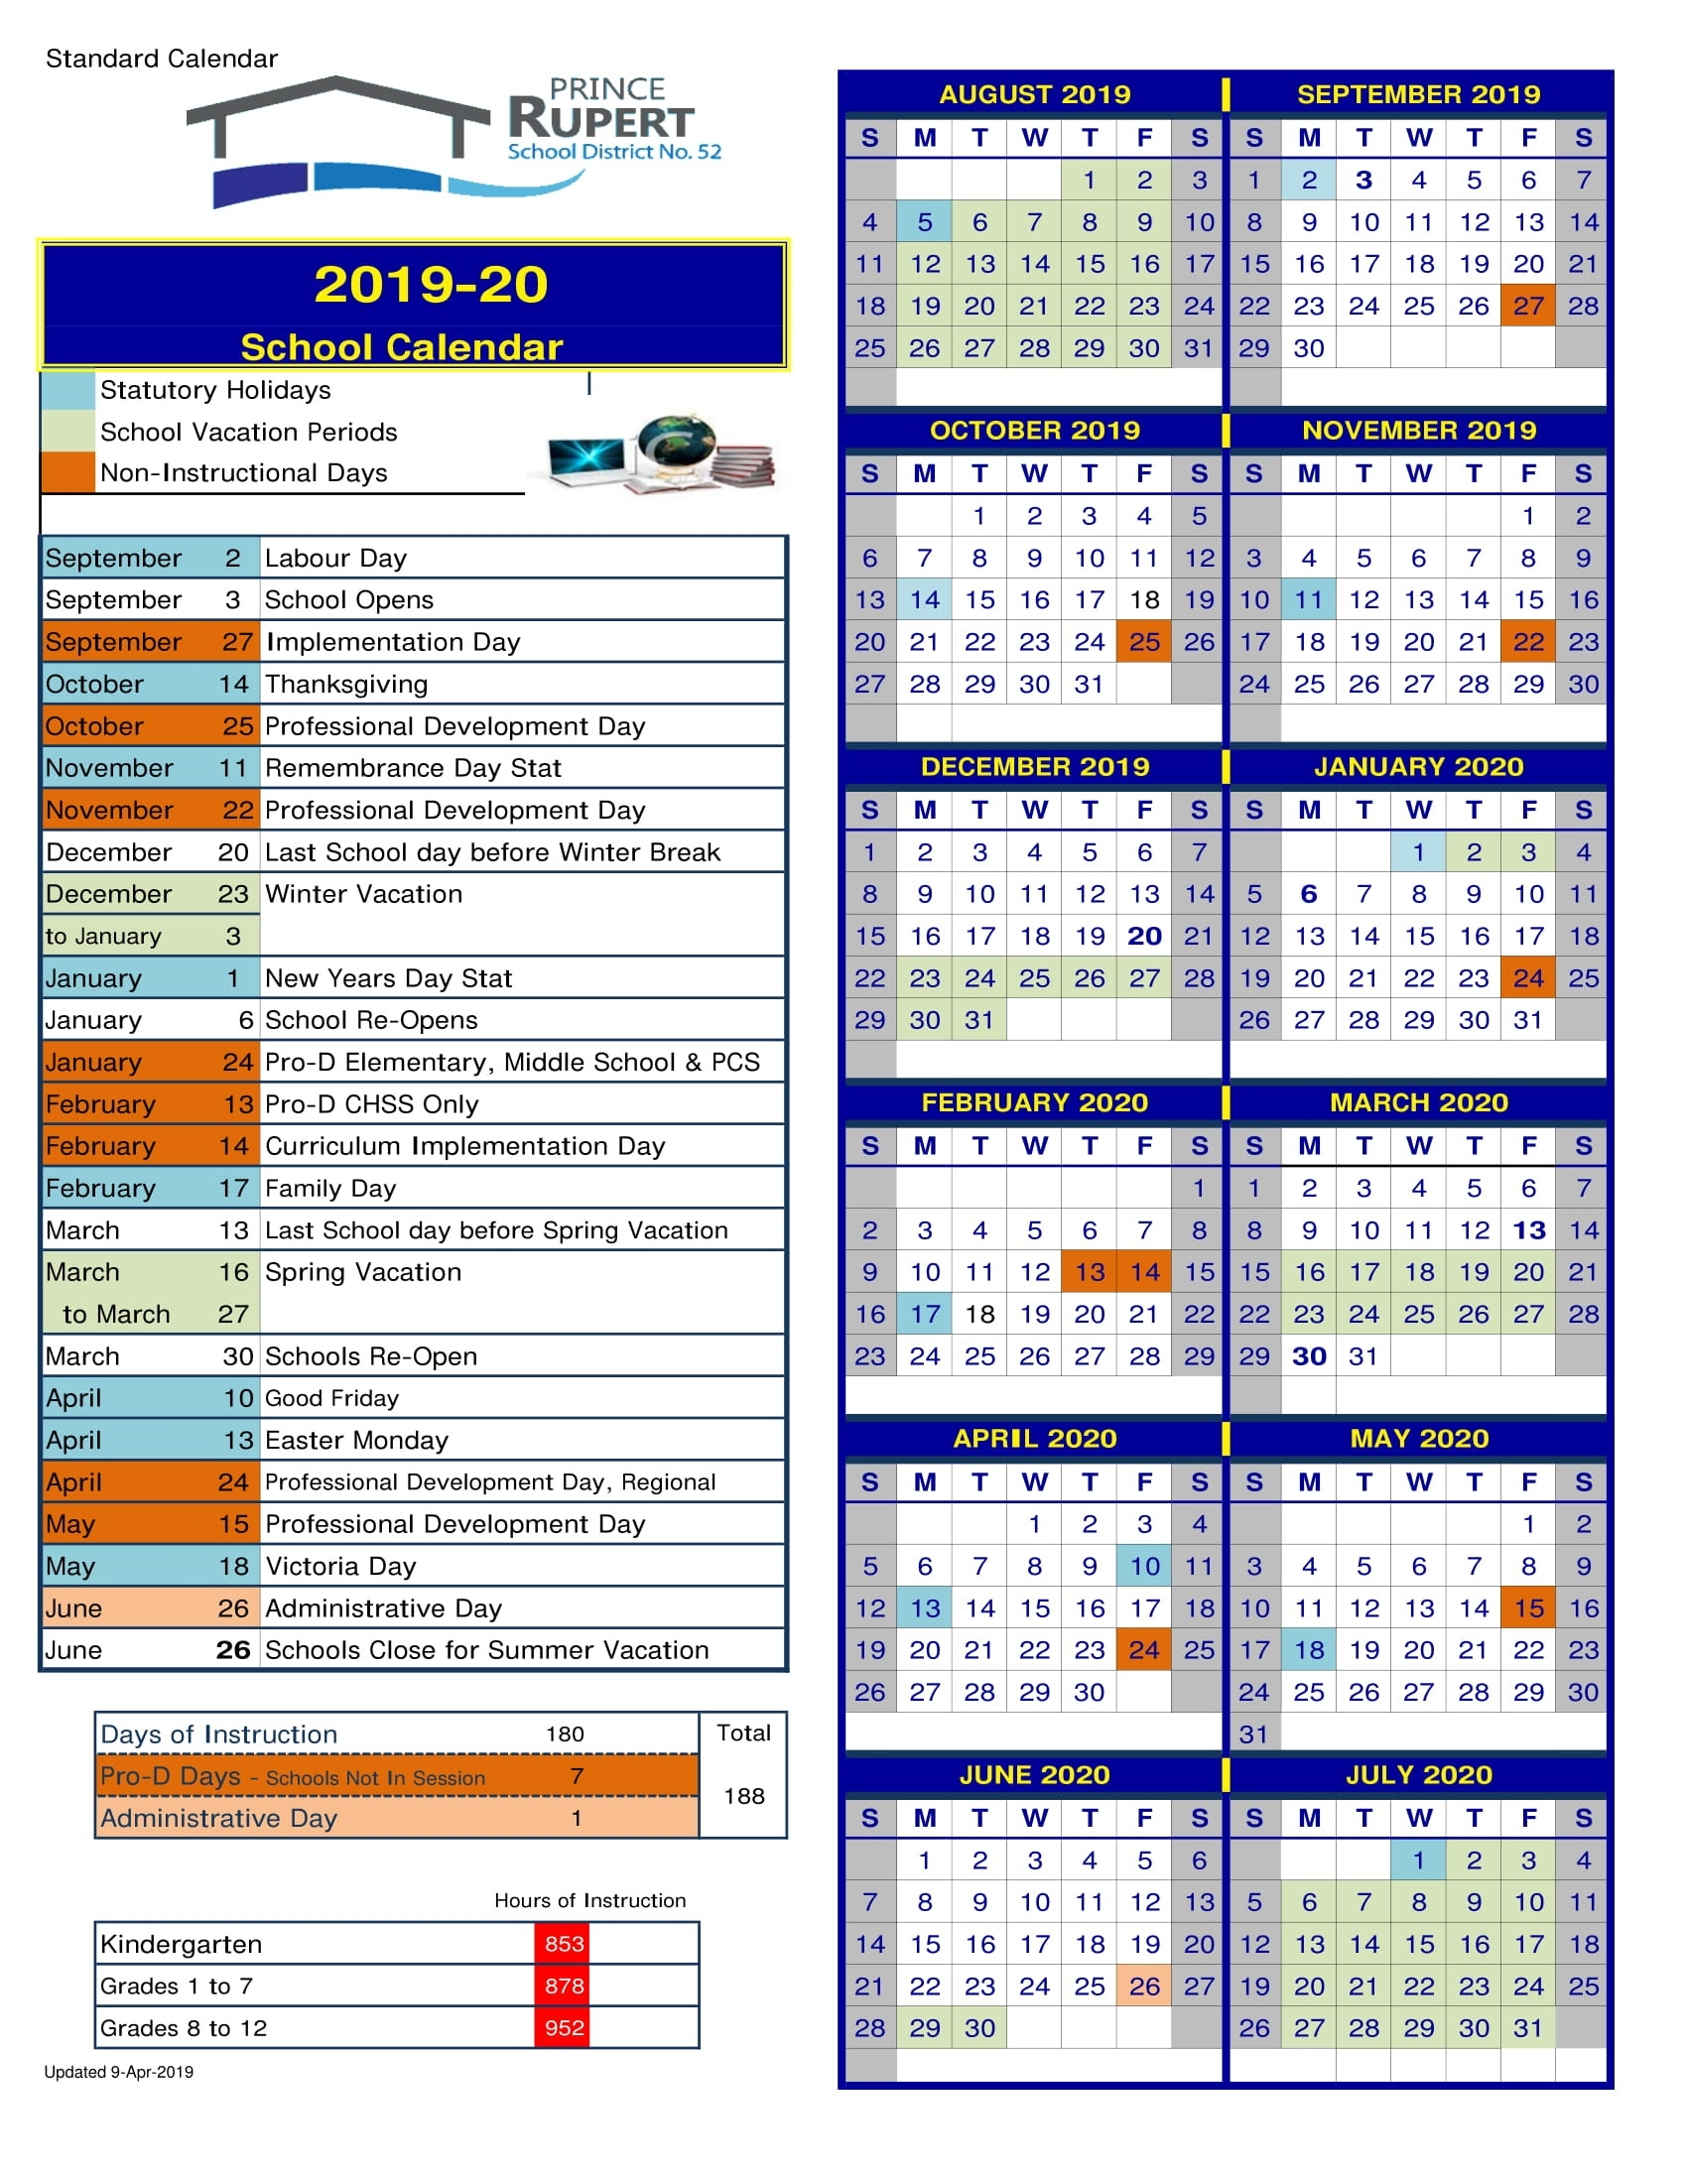 District School Calendar | School District 52_District 8 School Calendar